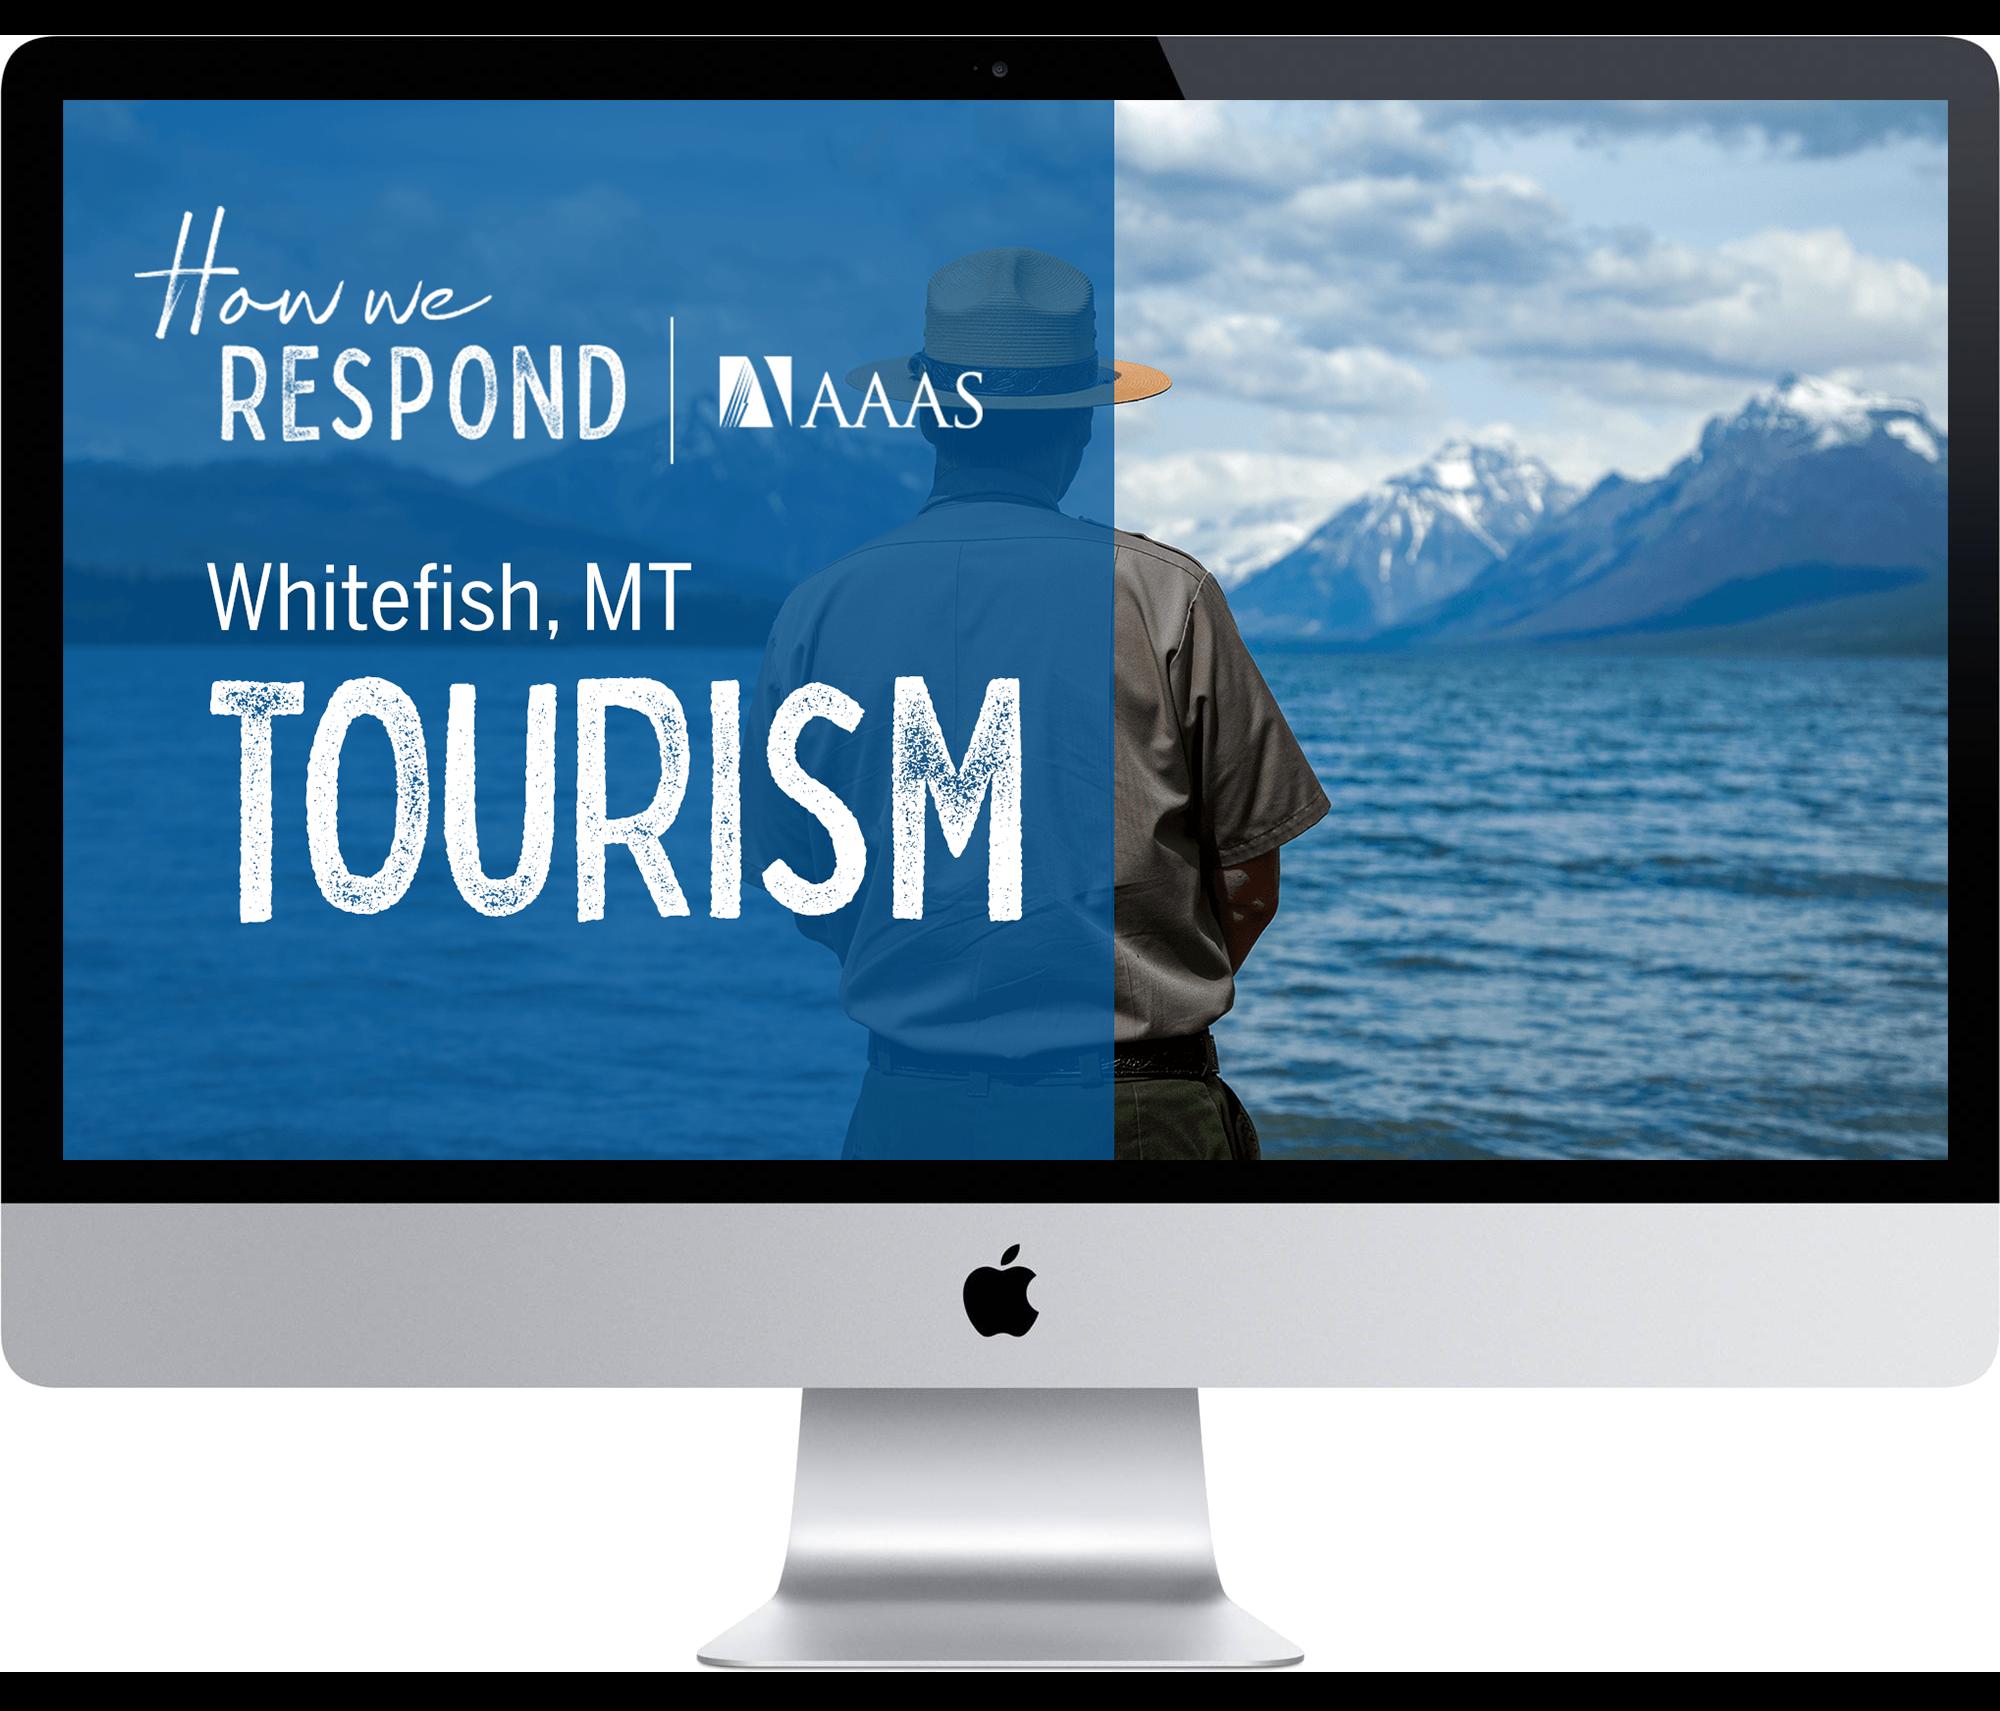 Whitefish, MT - Tourism